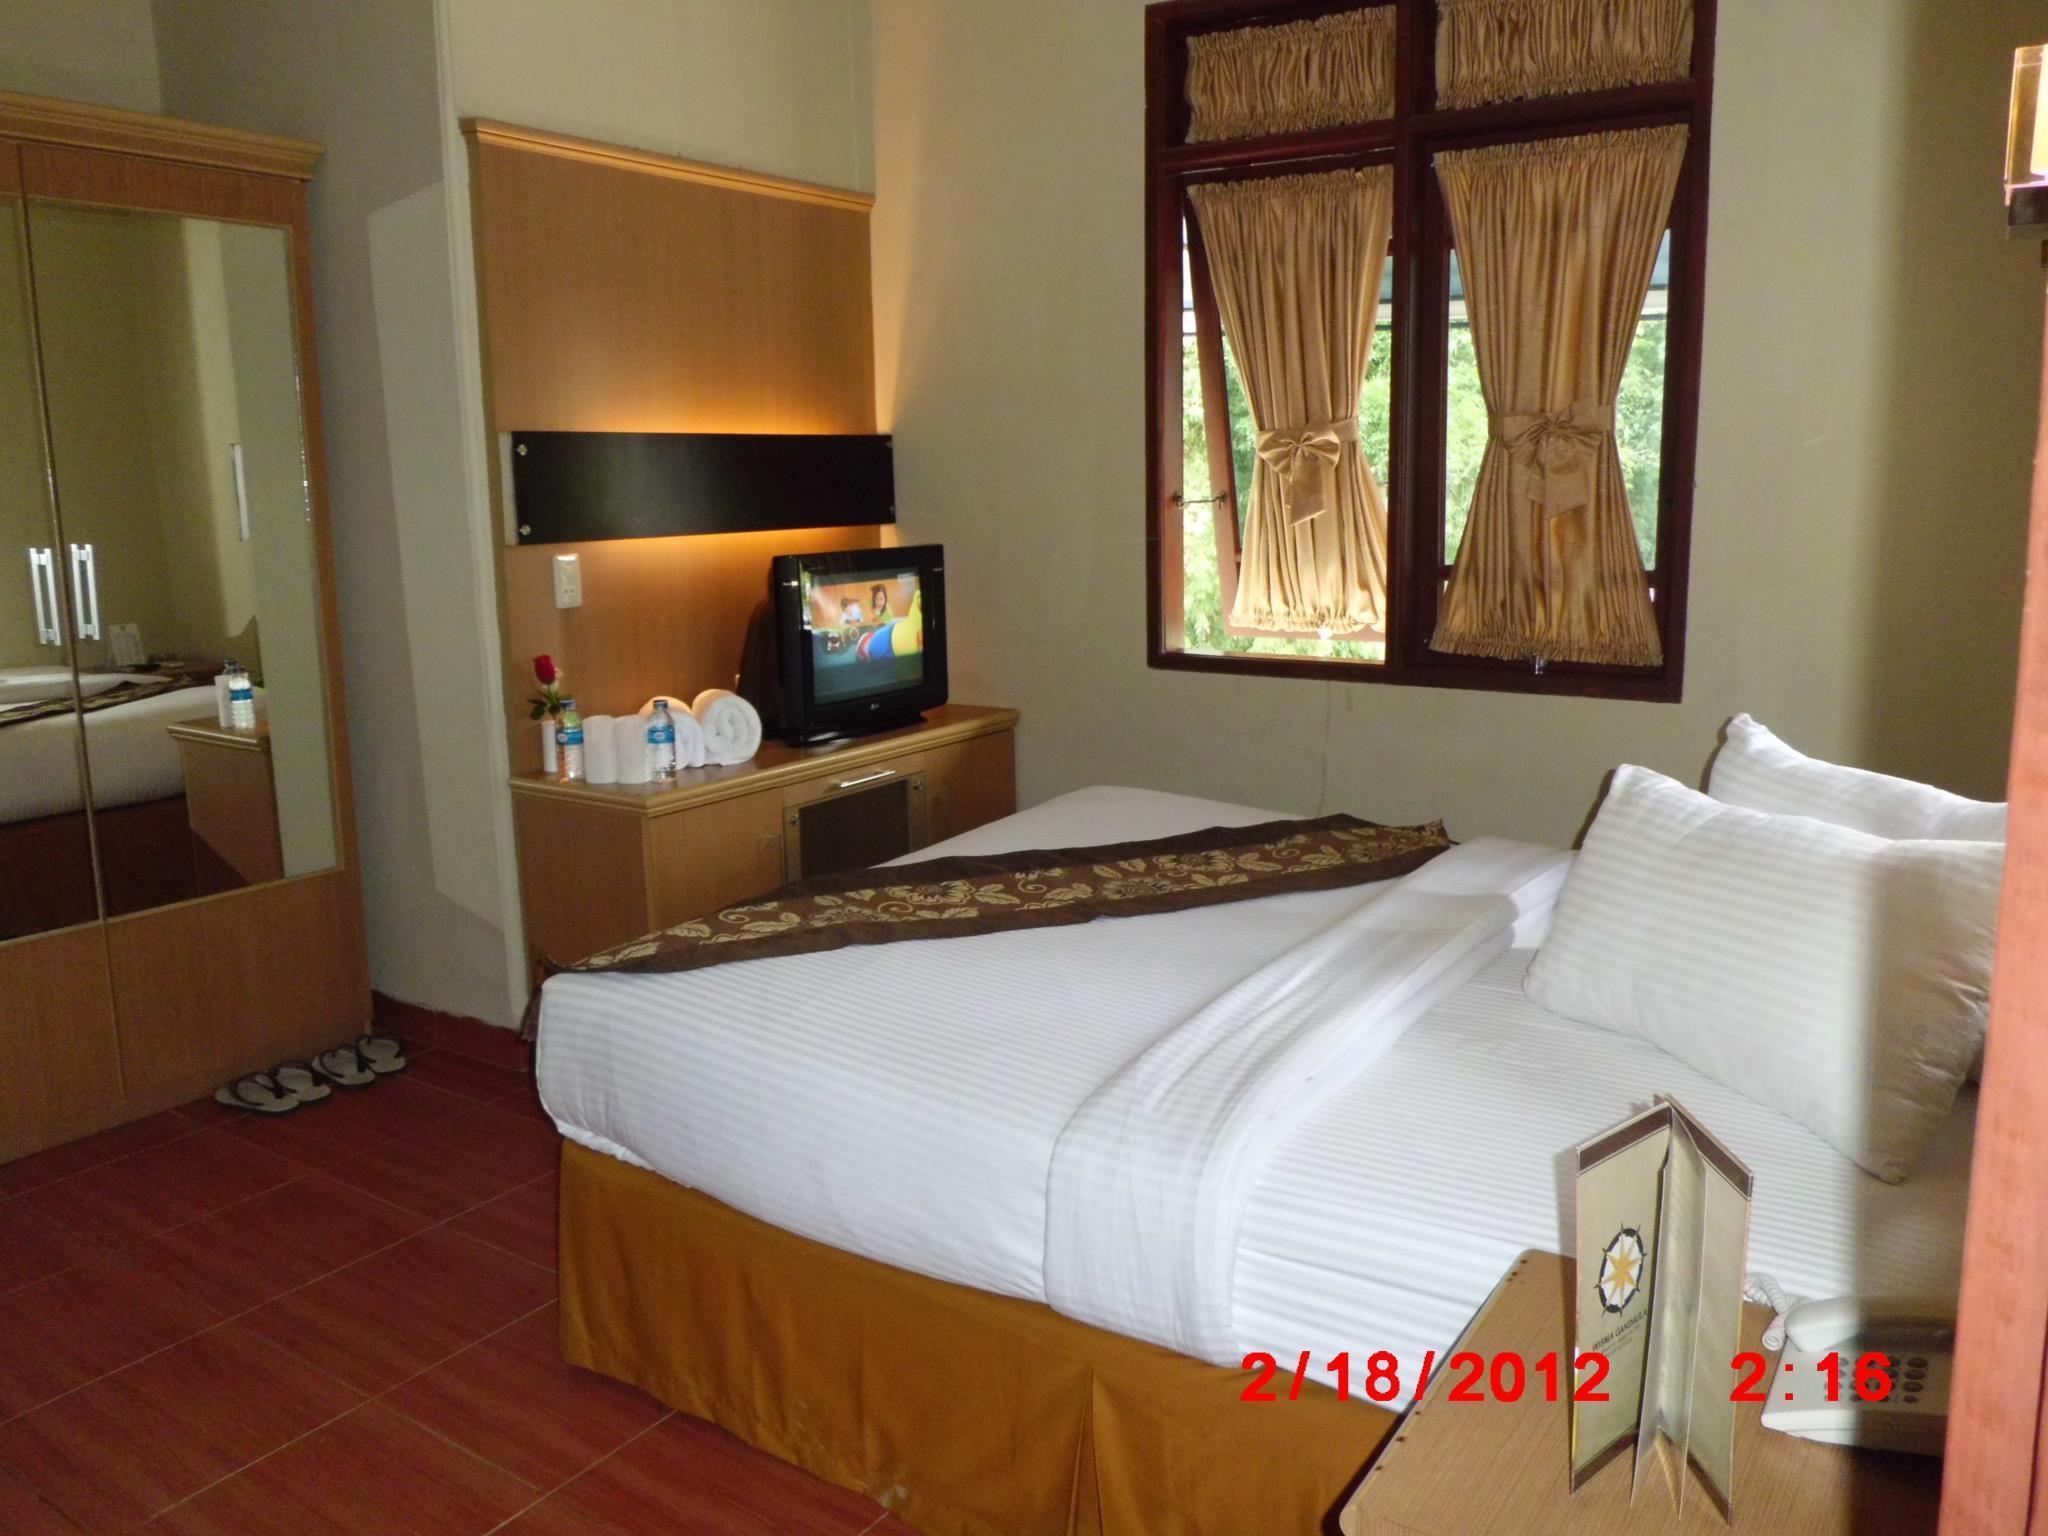 Wisma Gandaula Hotel, Pematangsiantar